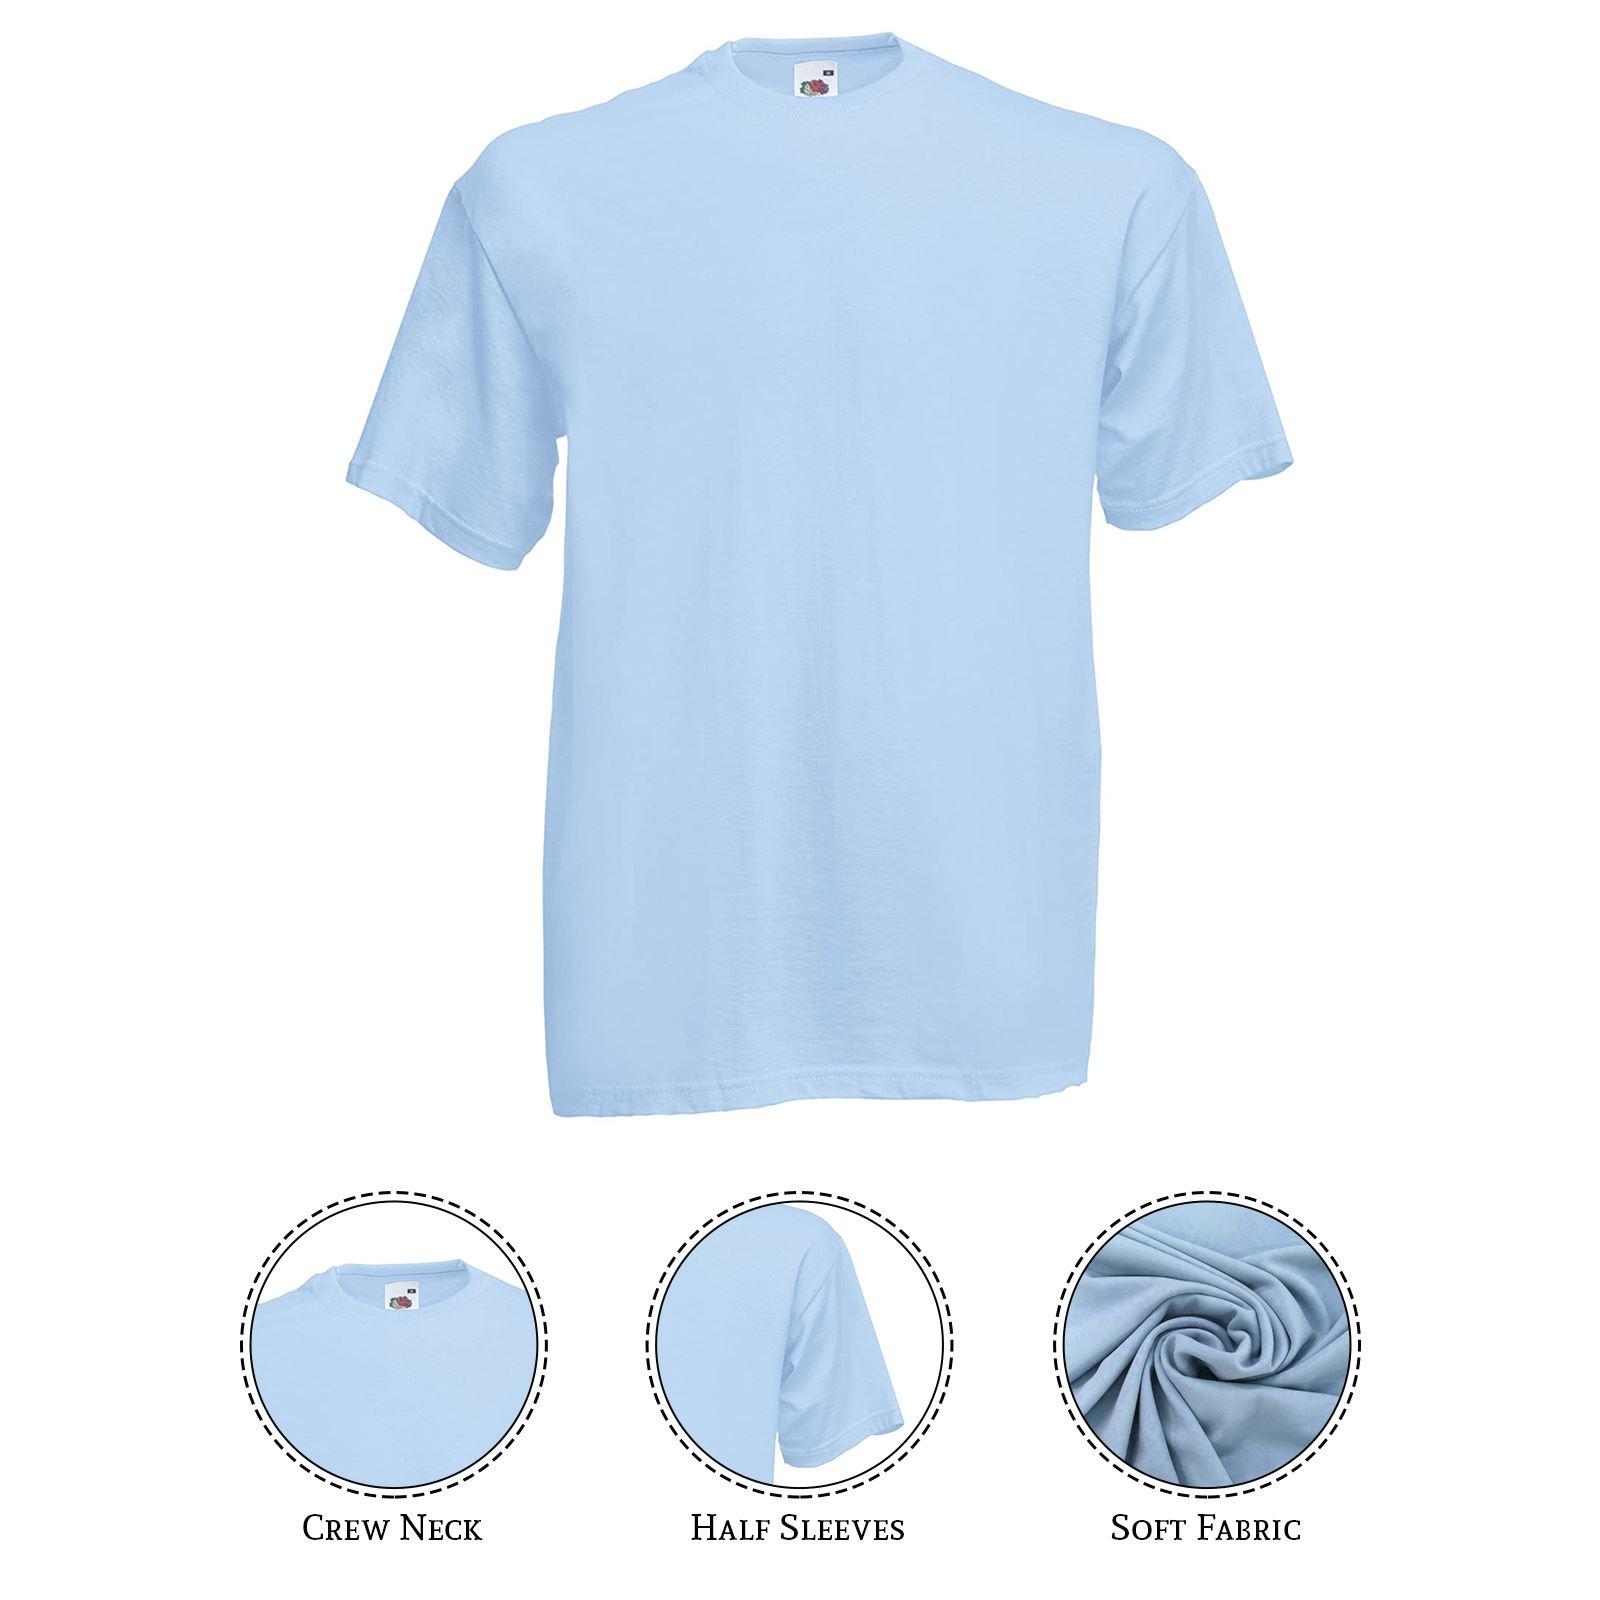 thumbnail 9 - Men-s-Fruit-Of-The-Loom-T-Shirt-Original-100-Cotton-Casual-Plain-Top-Tee